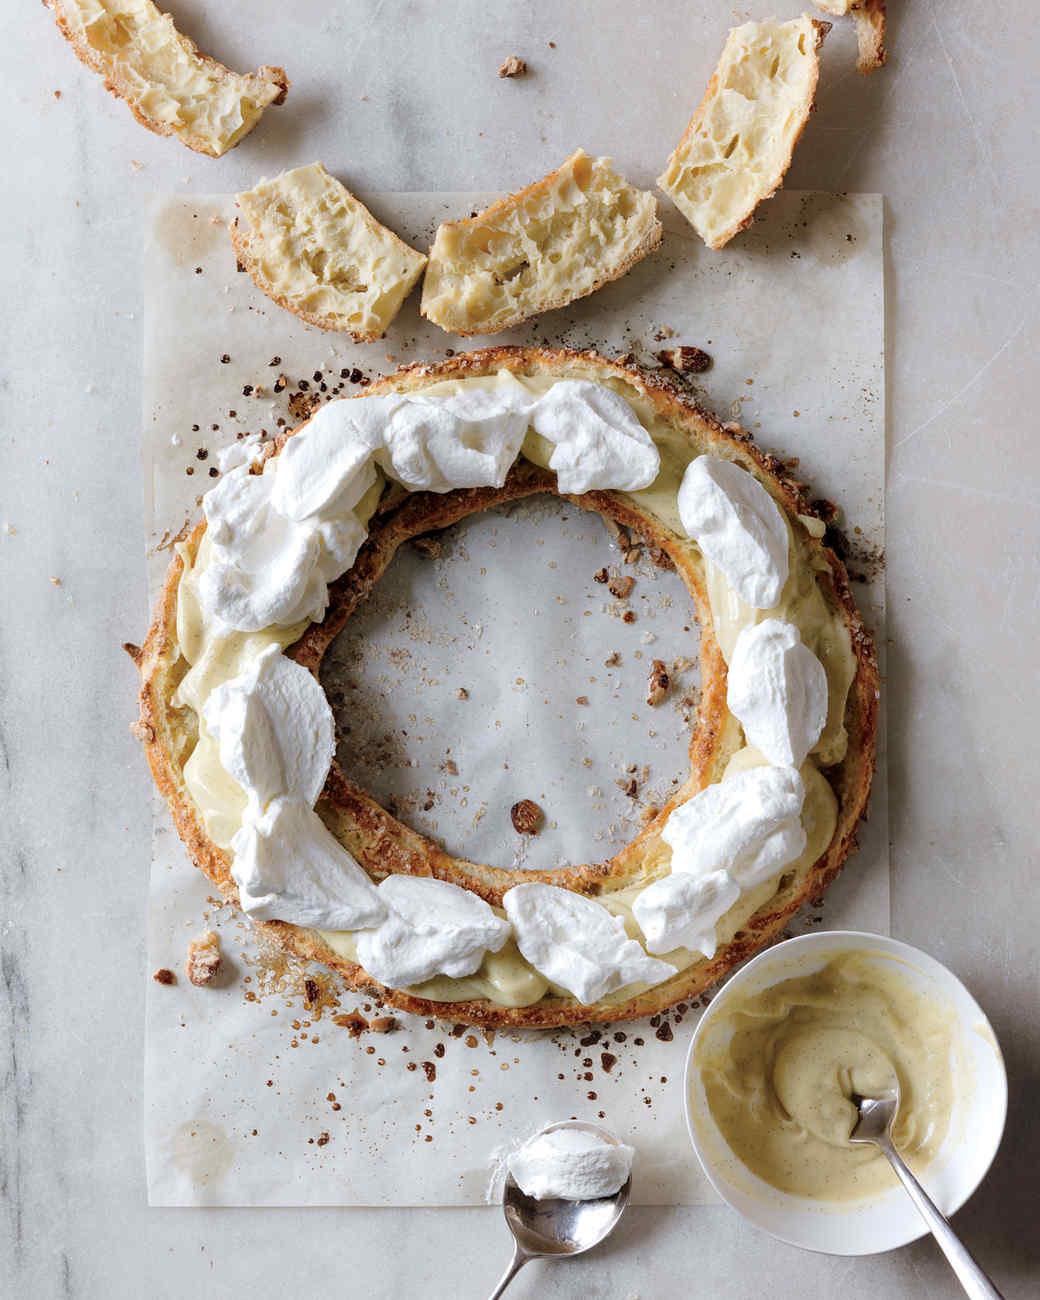 pastry-wreath-5-md107770.jpg